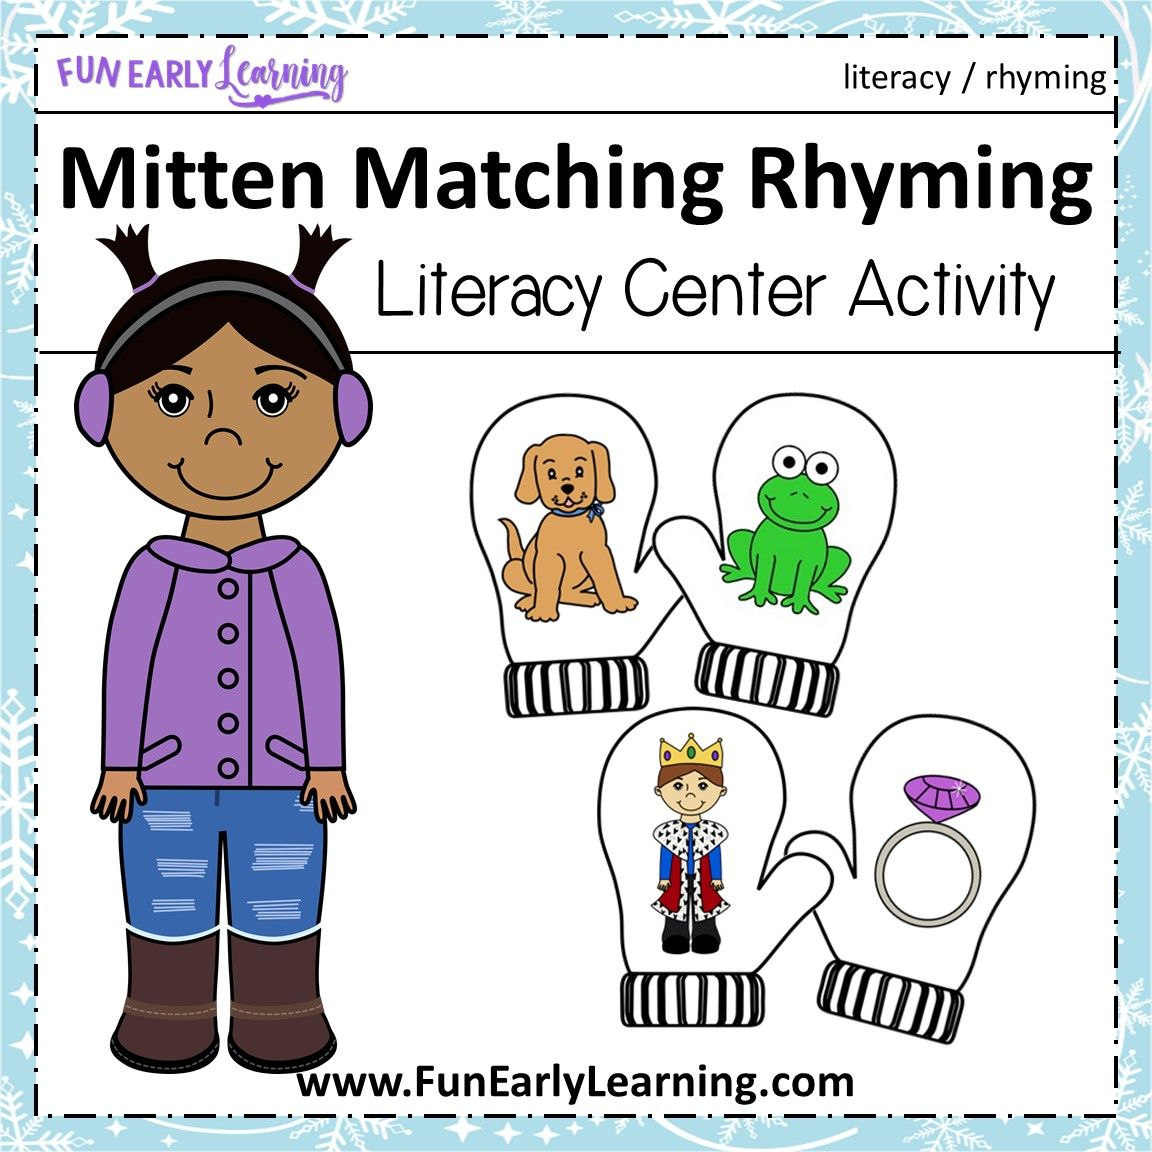 Mitten Matching Rhyming Activity